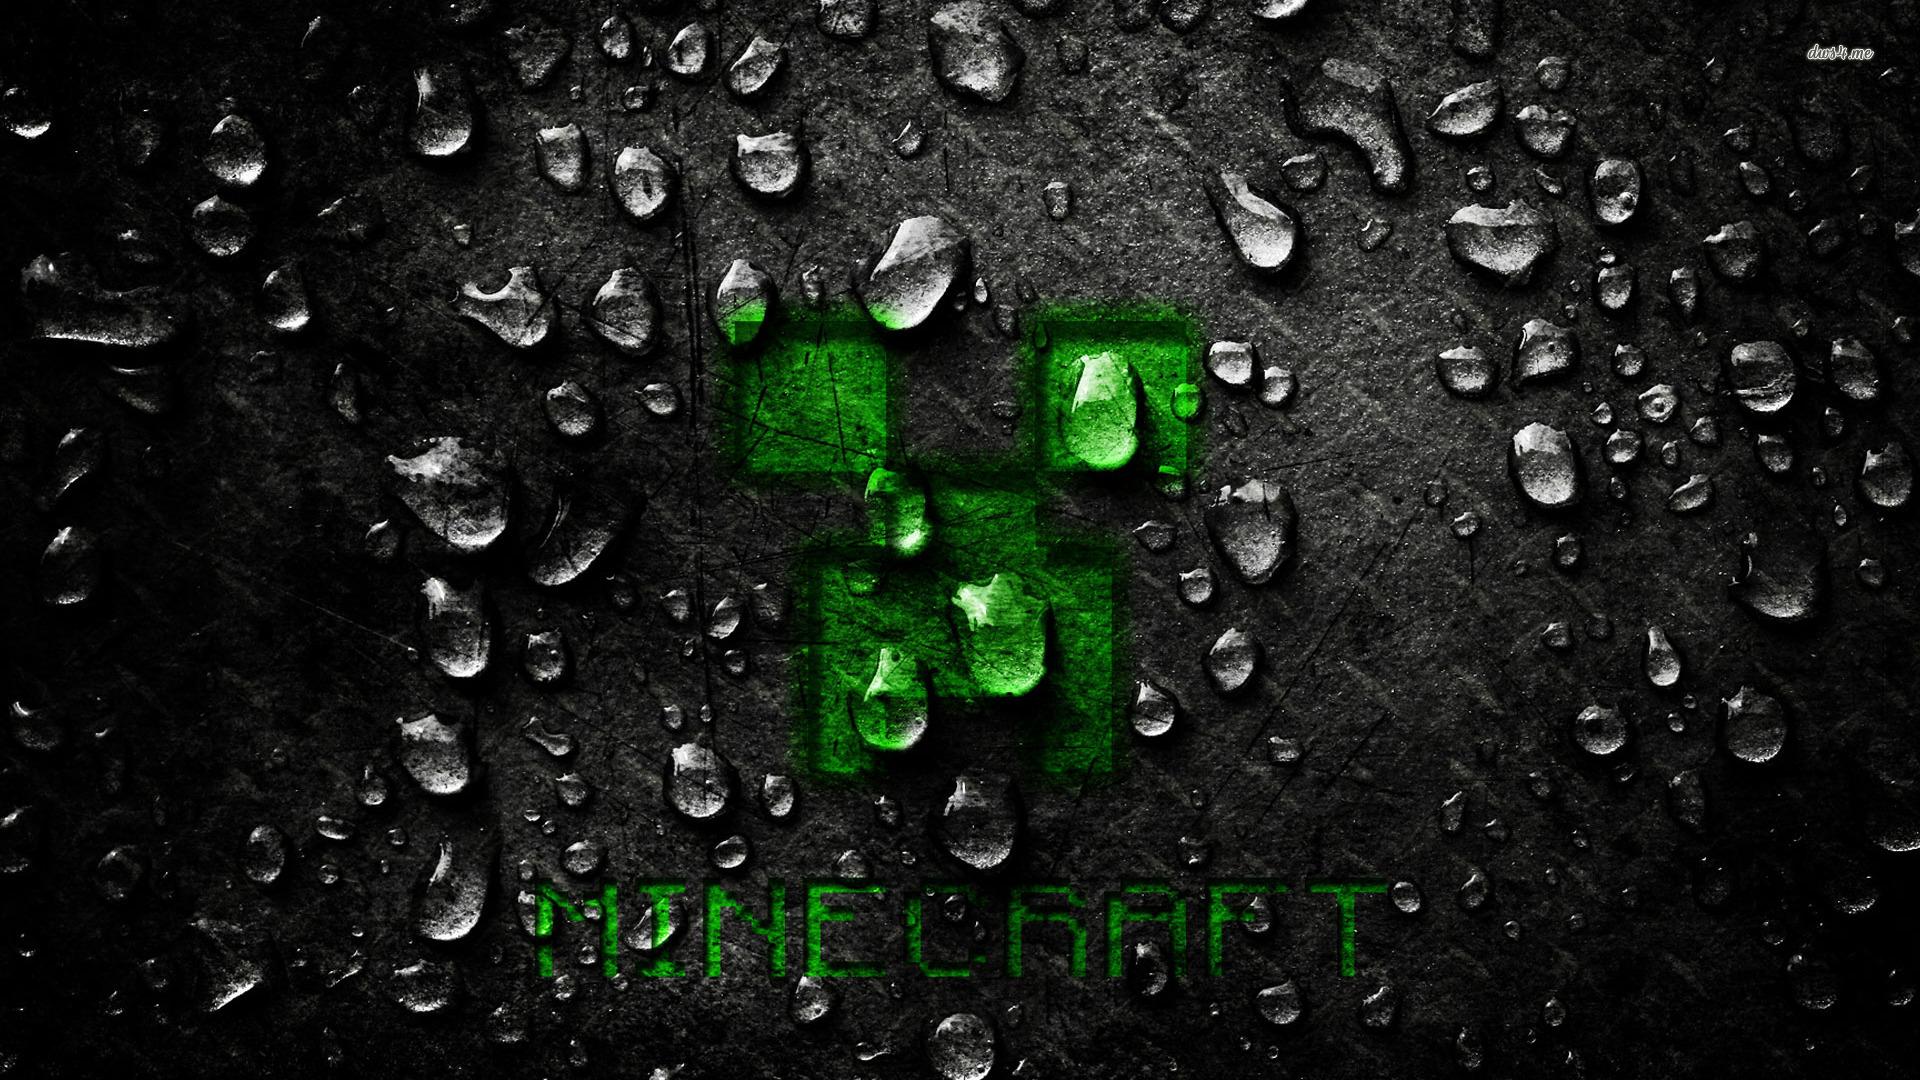 minecraft creeper fond ecran eau jeux video info. Black Bedroom Furniture Sets. Home Design Ideas